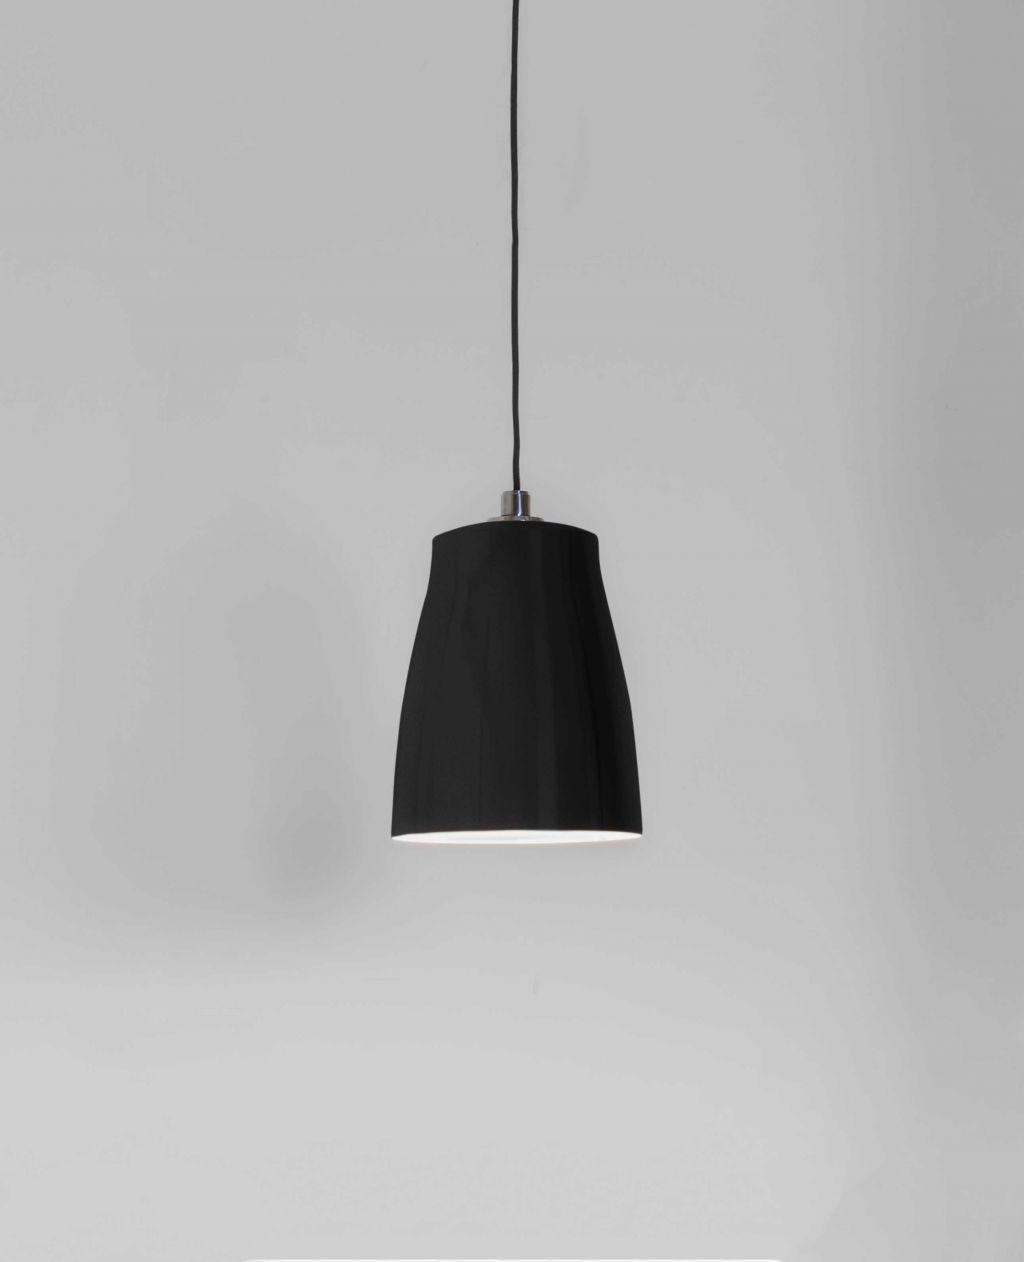 ASTRO Atelier Pendant 150 Painted Black (1224019)